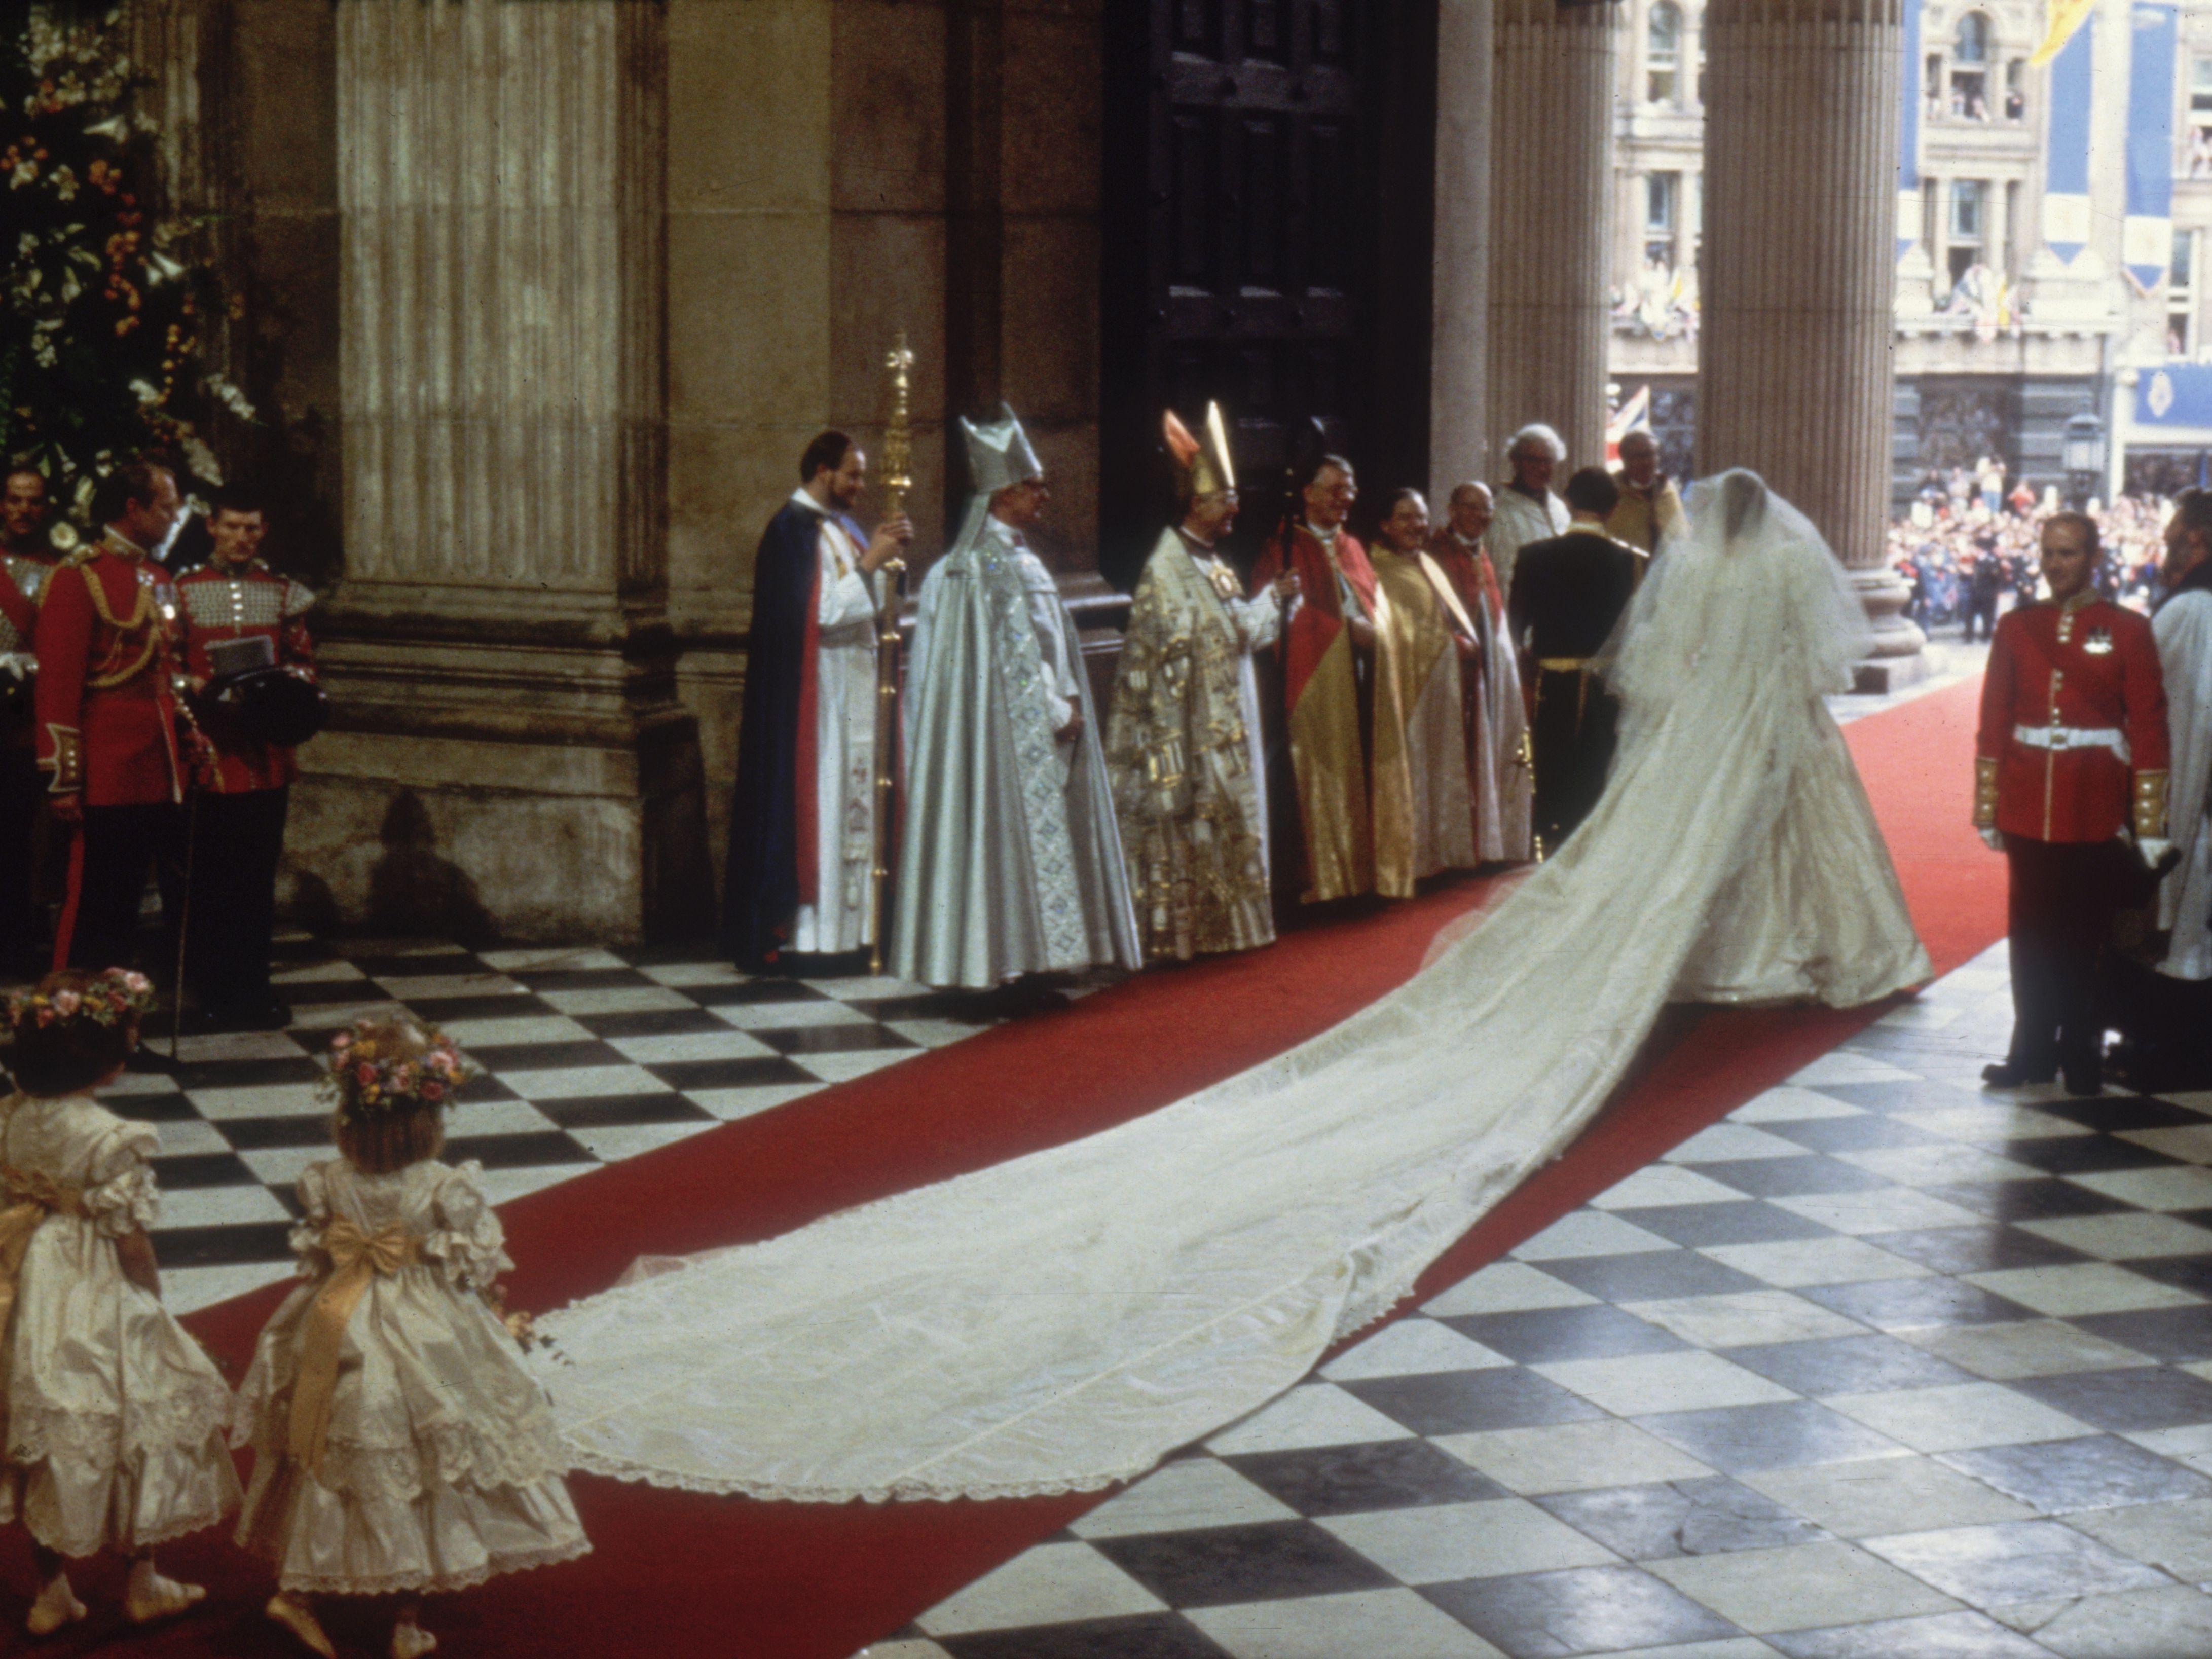 Princess Diana S Wedding Few Hints Of Sad Future